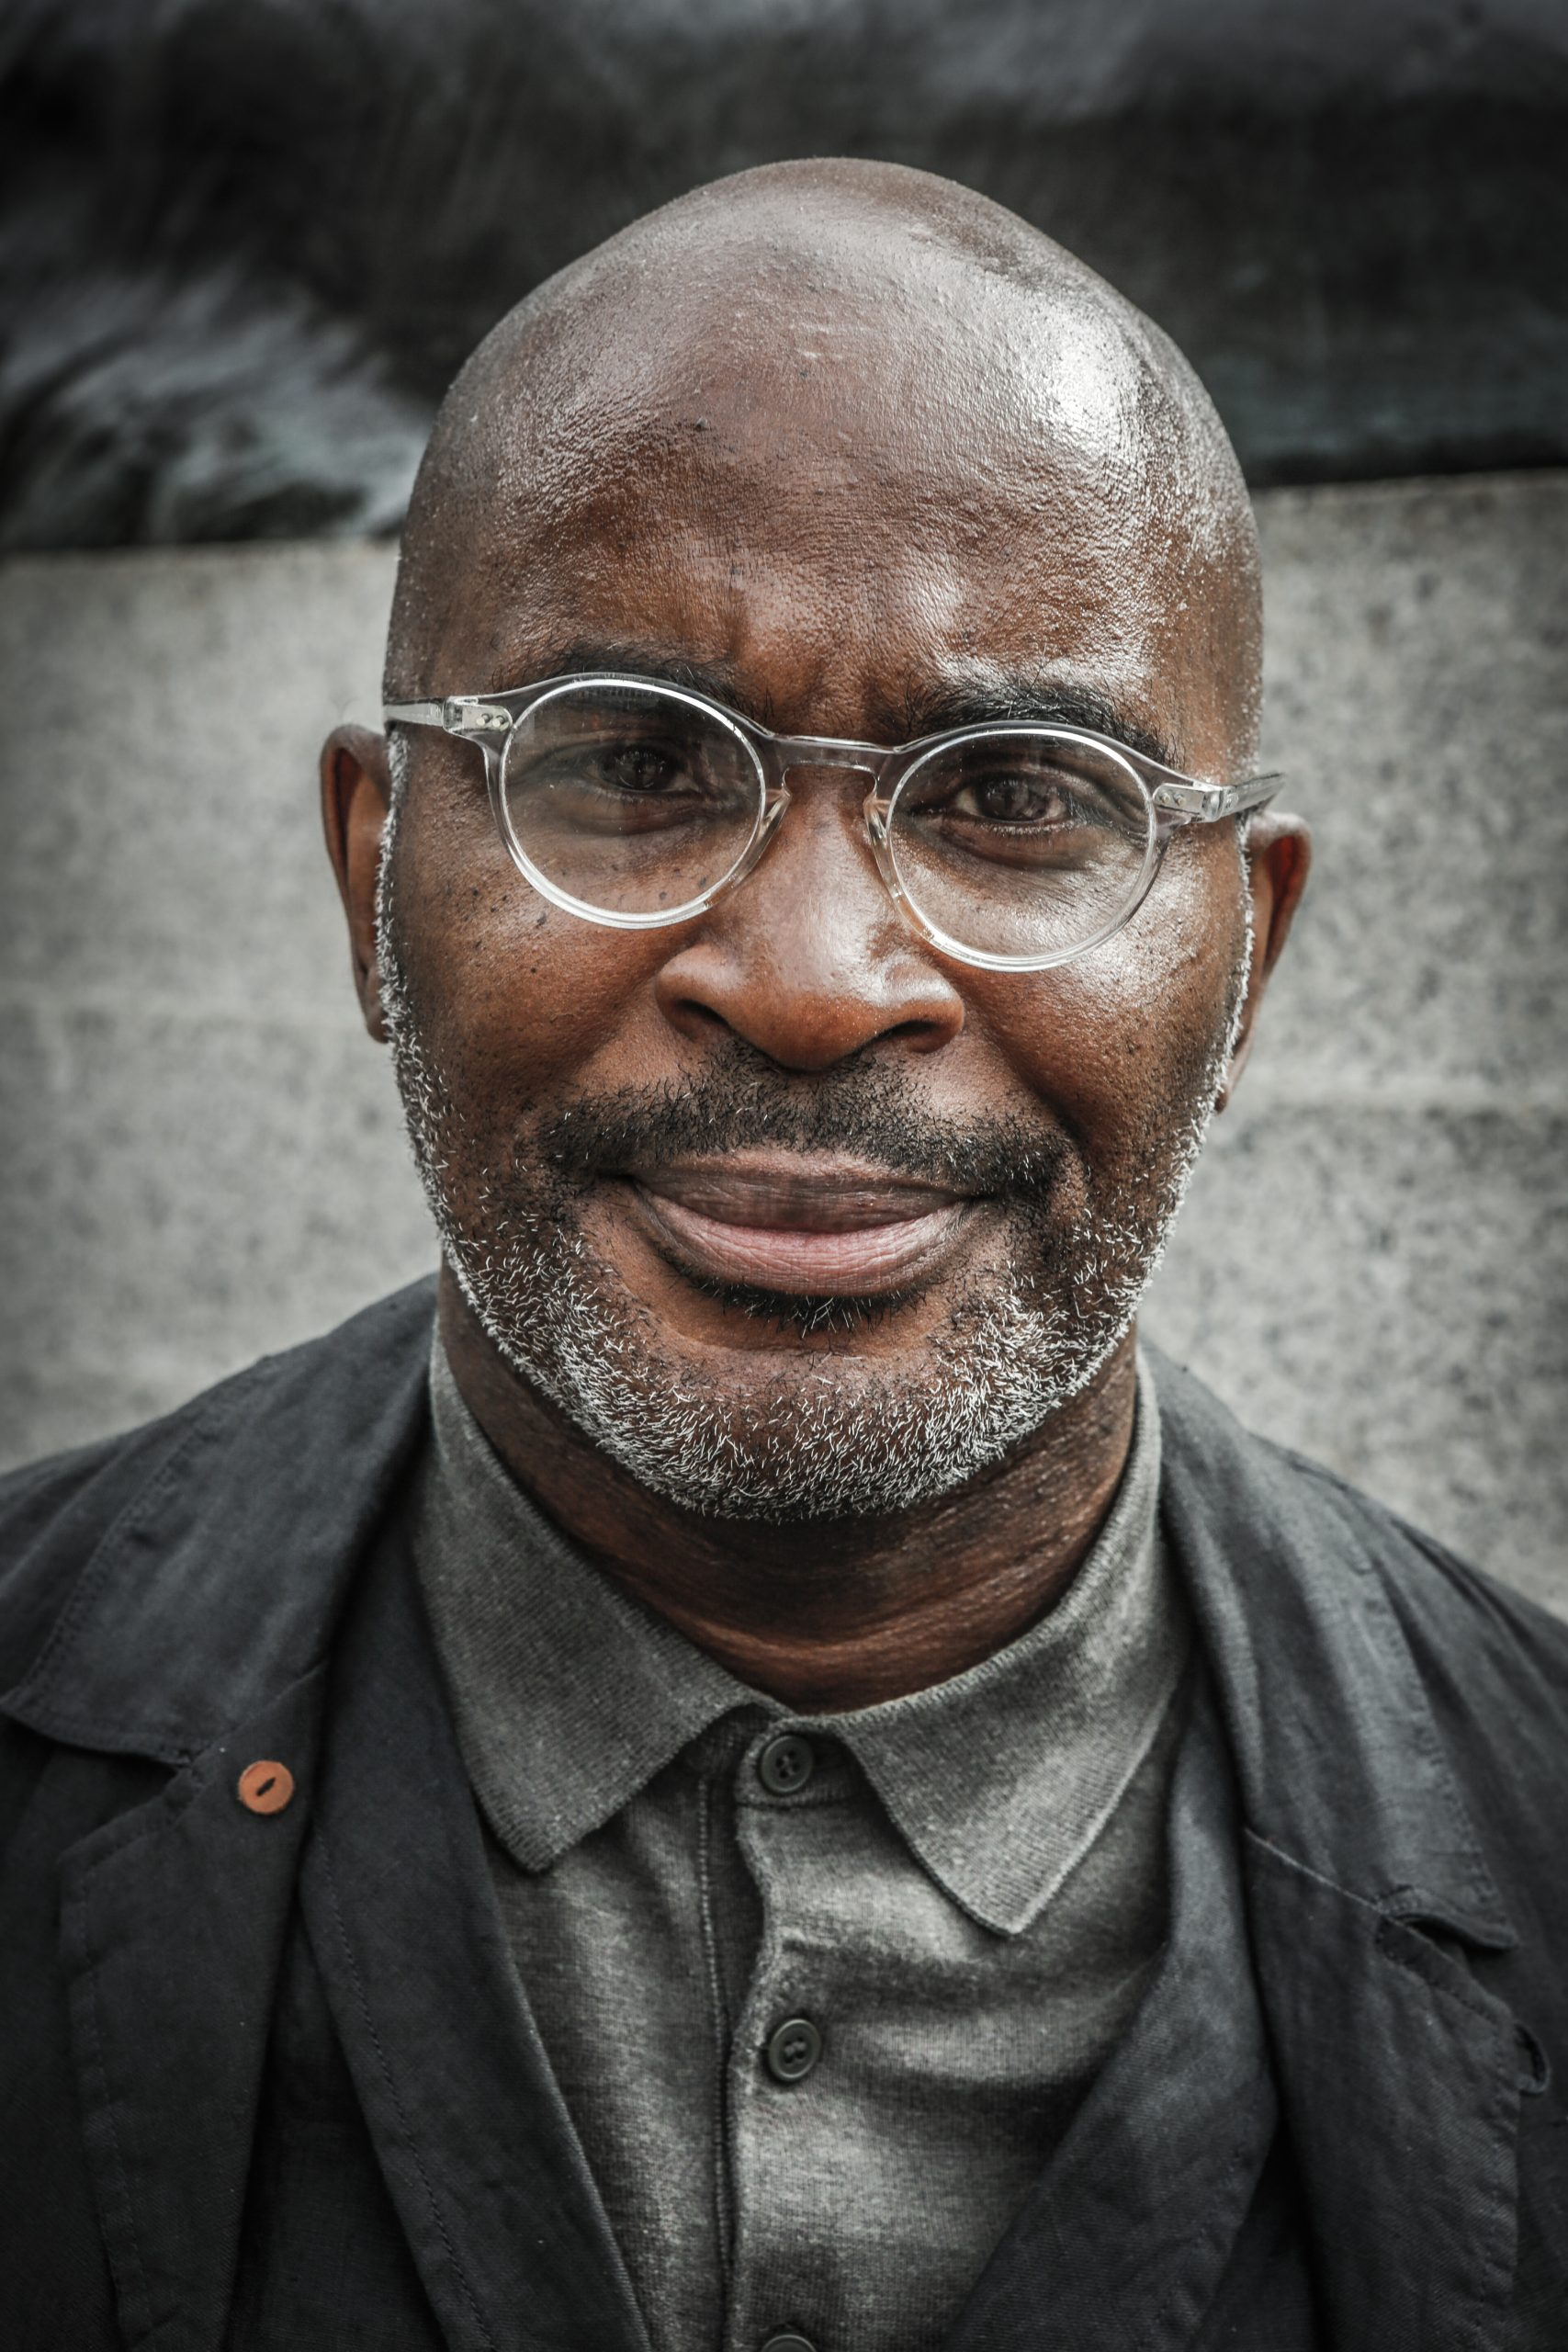 Prof. Robert Beckford - Image by Paul Bankole Iwala